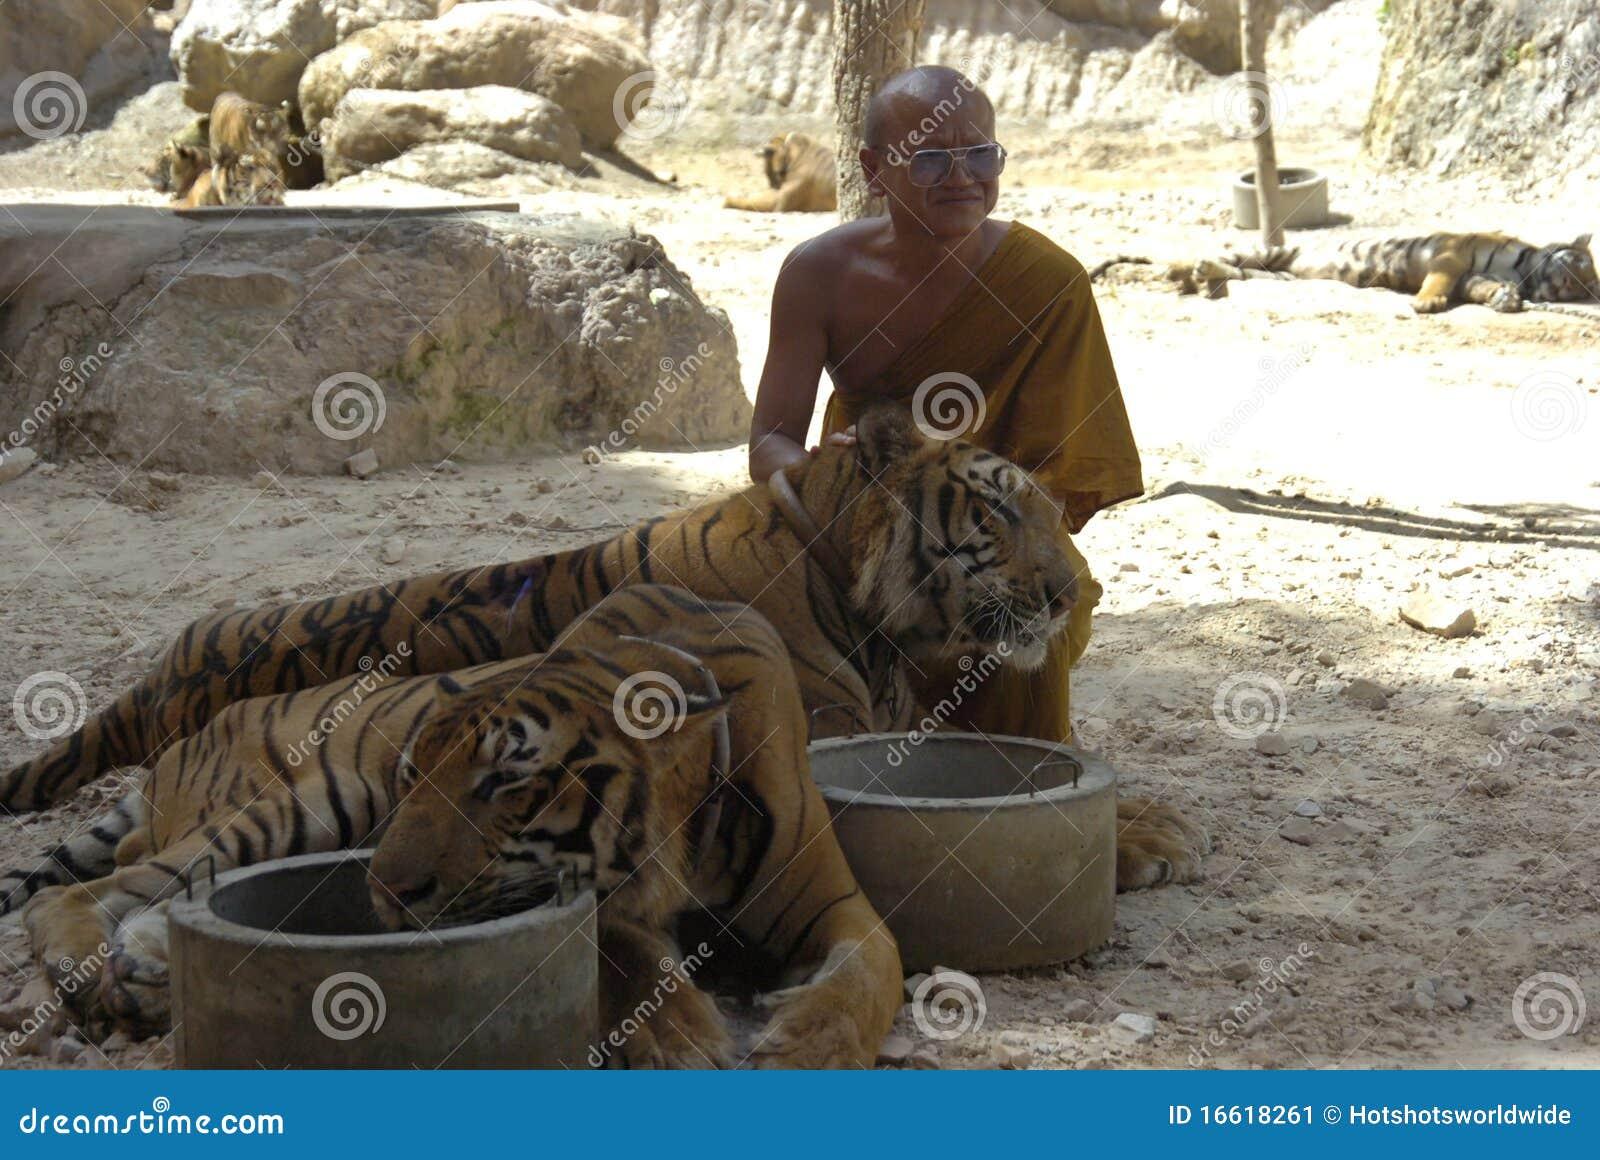 Monje budista con el tigre de bengala tailandia asia for Bengala asia